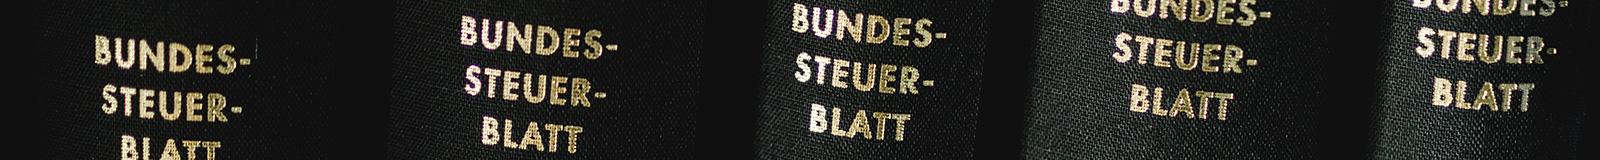 https://www.timmerbeil-wp.de/uploads/images/headerimages/Leistungen-Steuerberatung.jpg